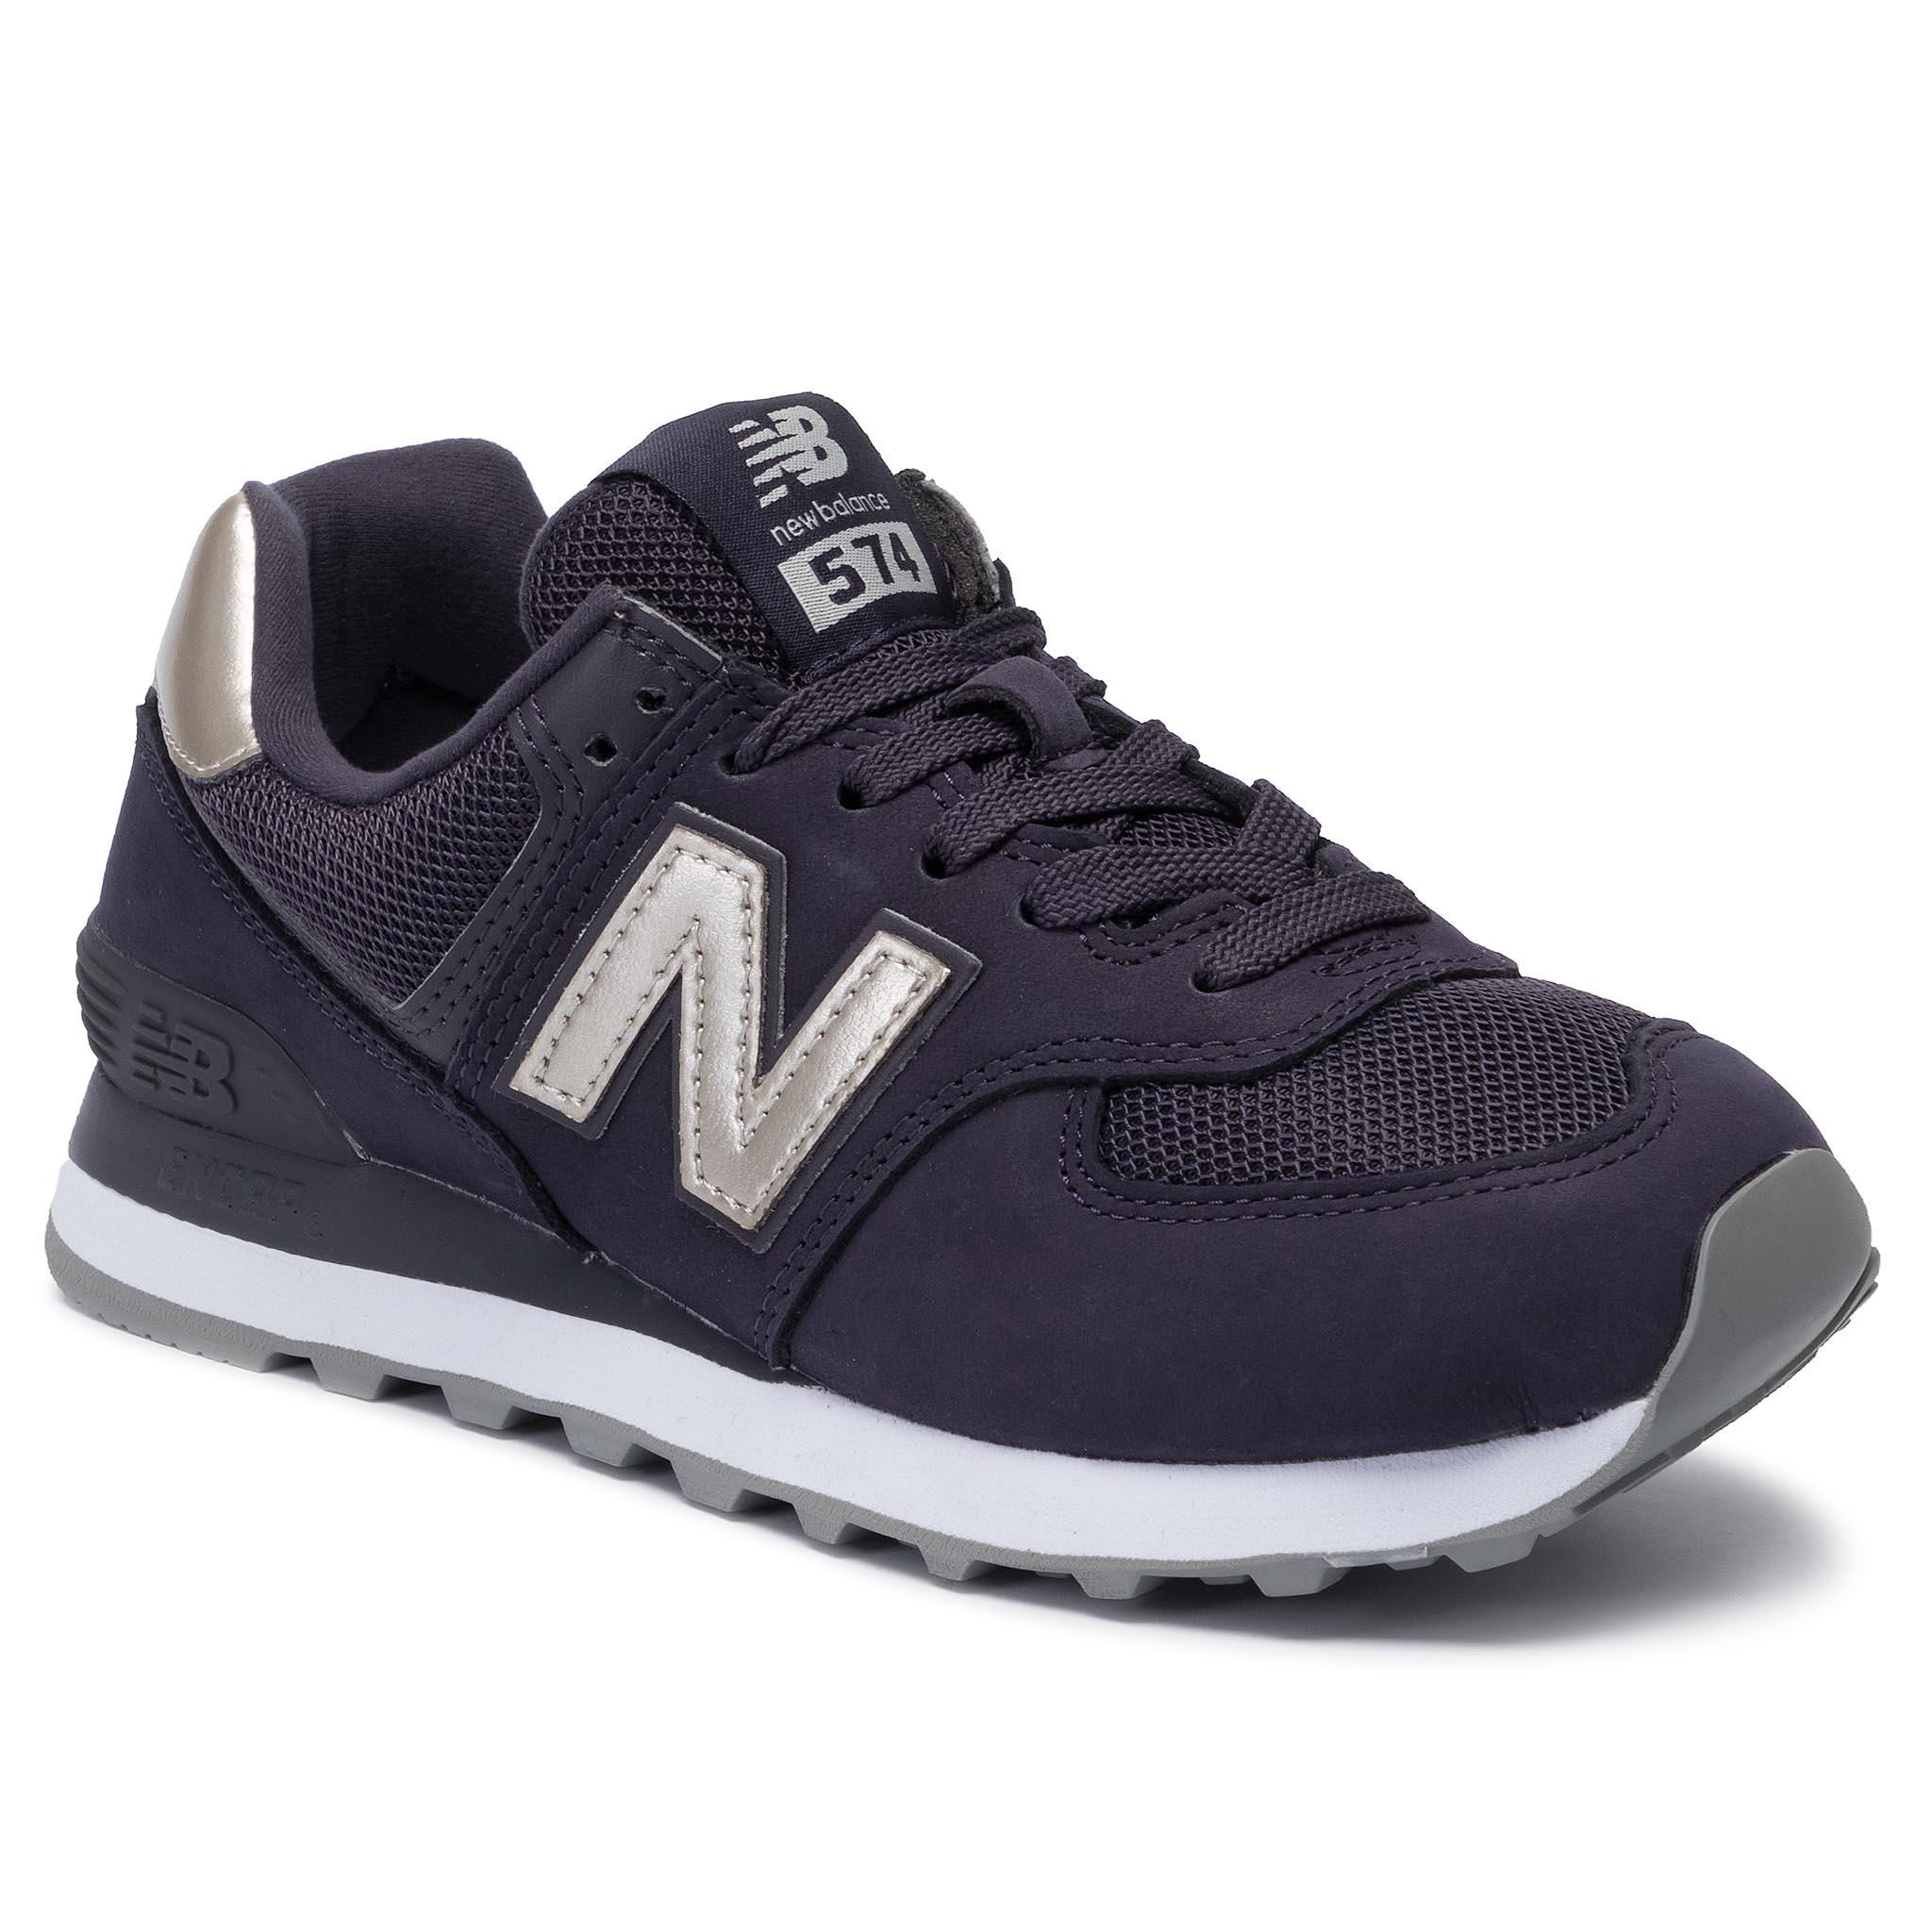 buy popular 28c8f 910d2 Sneakers NEW BALANCE - WL574KSD Navy Blue Purple - Sneakers ...